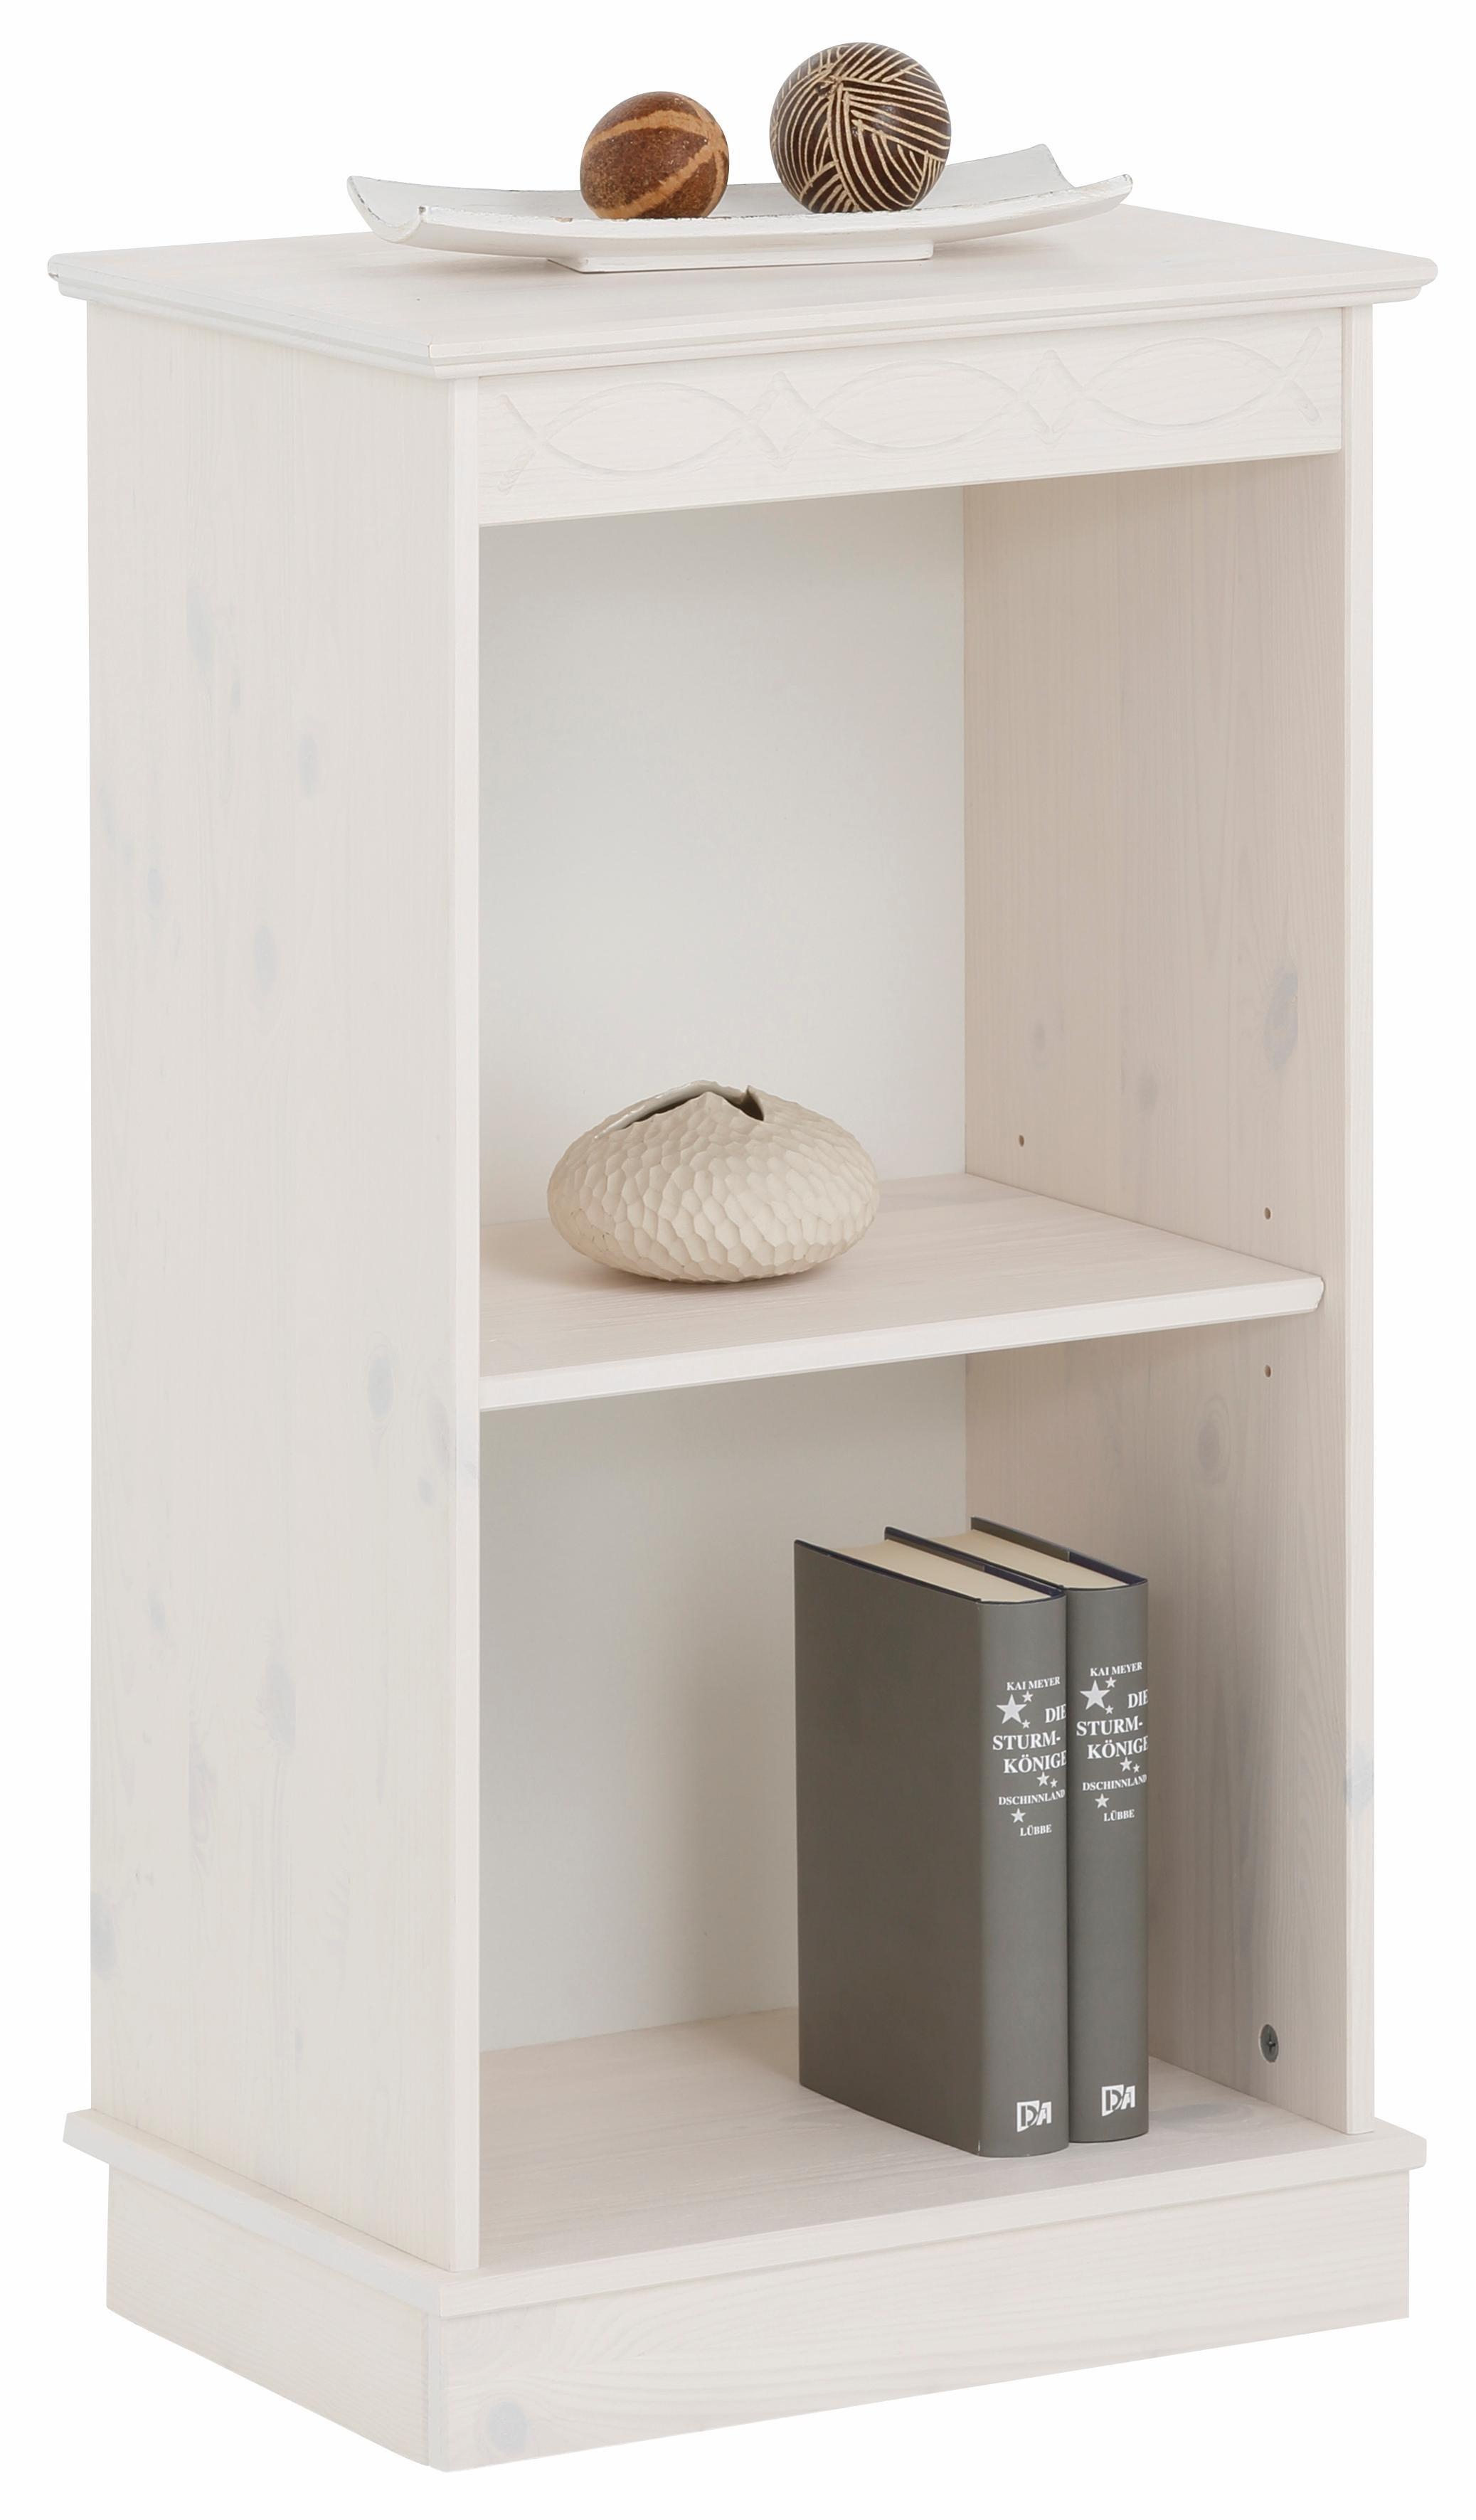 https://i.otto.nl/i/otto/16443411/home-affaire-boekenkast-indra-in-5-verschillende-afm-wit.jpg?$ovnl_seo_index$